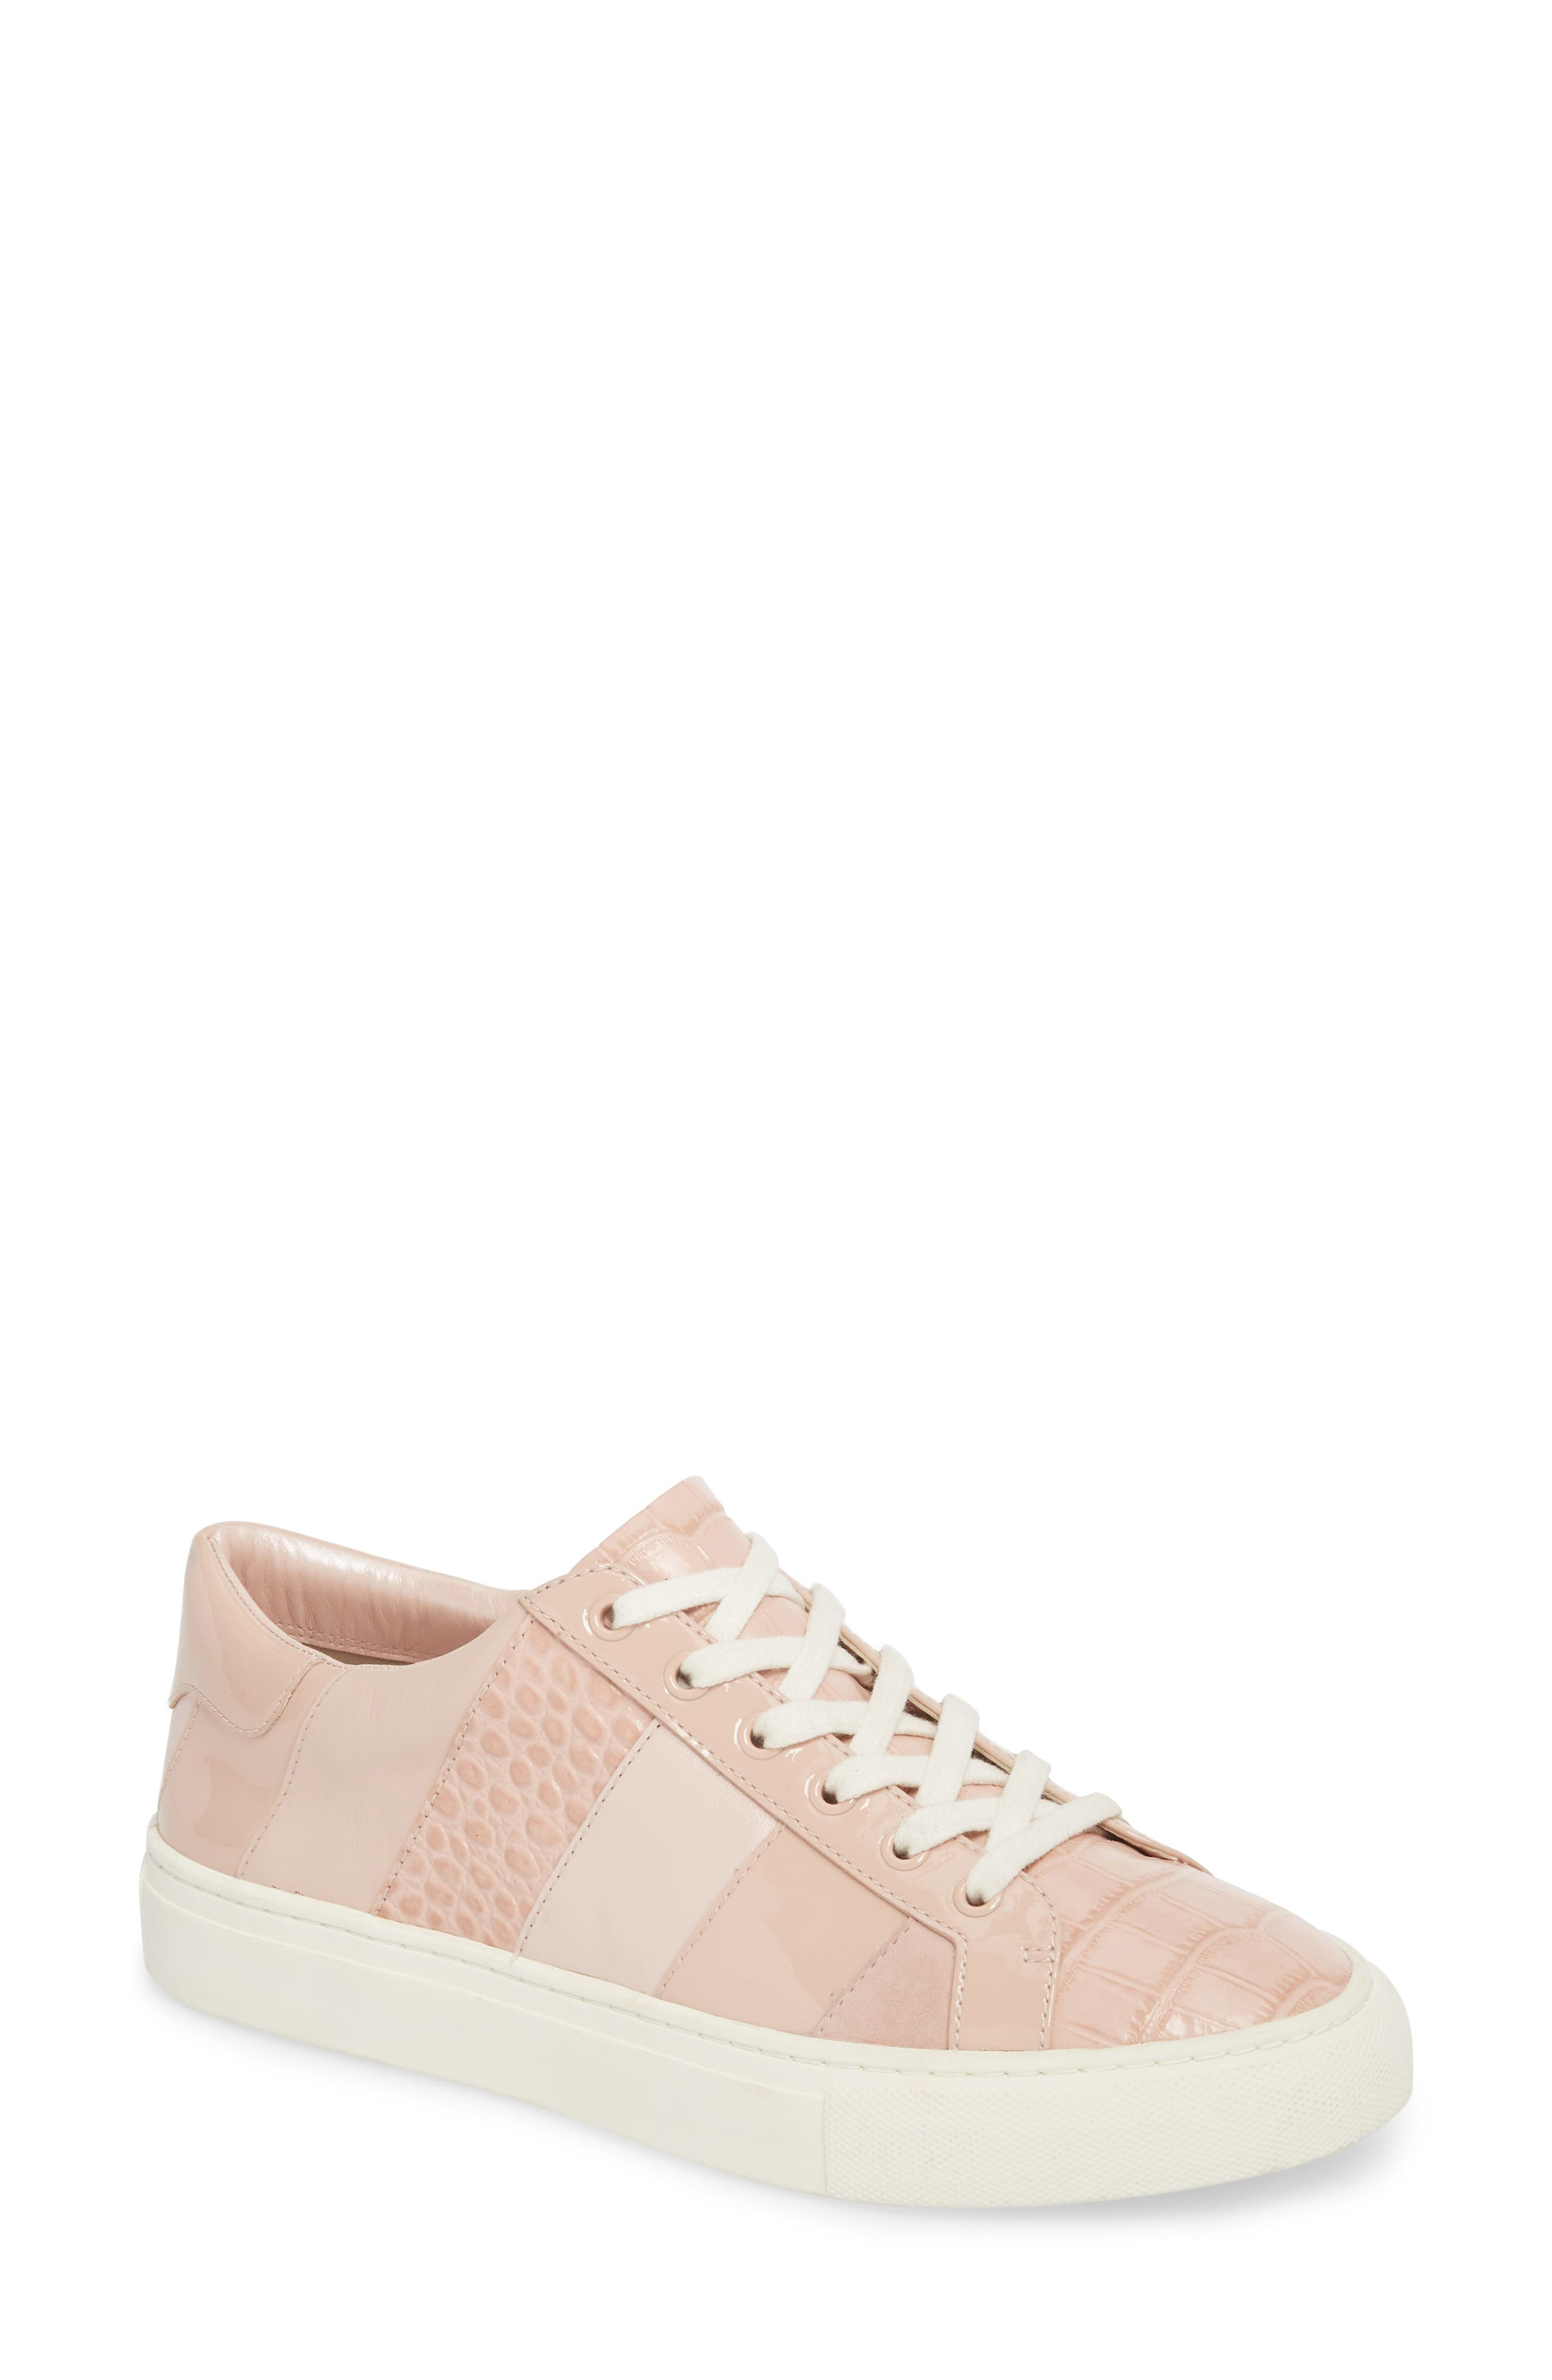 Ames Sneaker,                         Main,                         color, Sea Shell Pink/ Sea Shell Pink